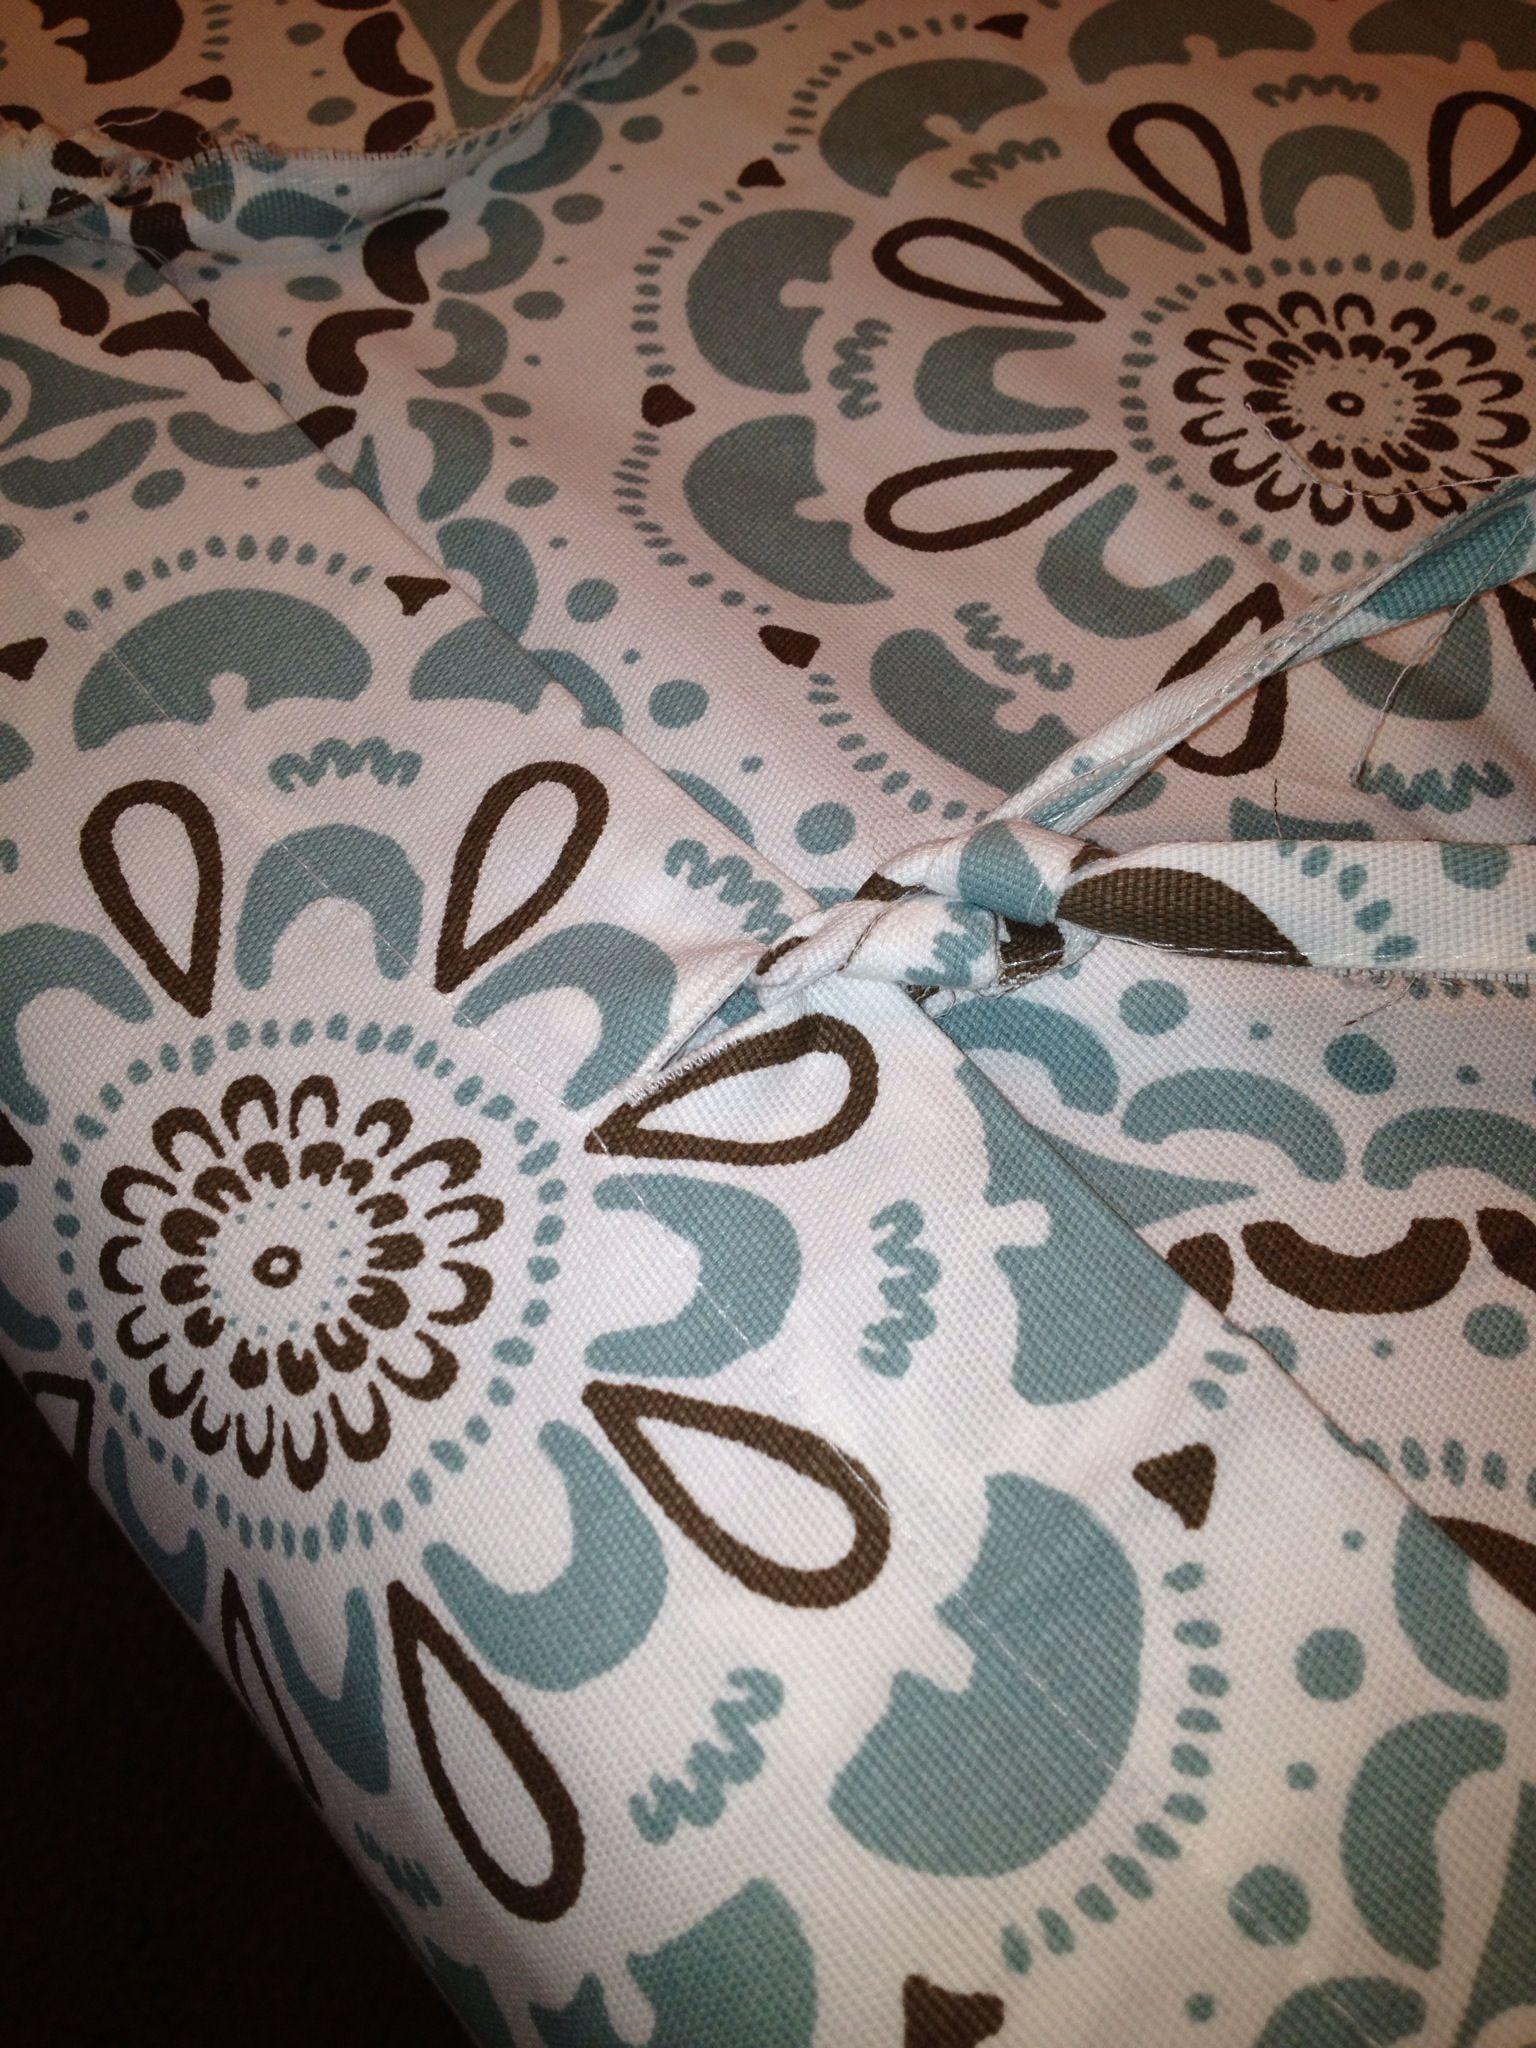 I M Feeling Like A Dang Darn Genius I Used A Pretty Fabric